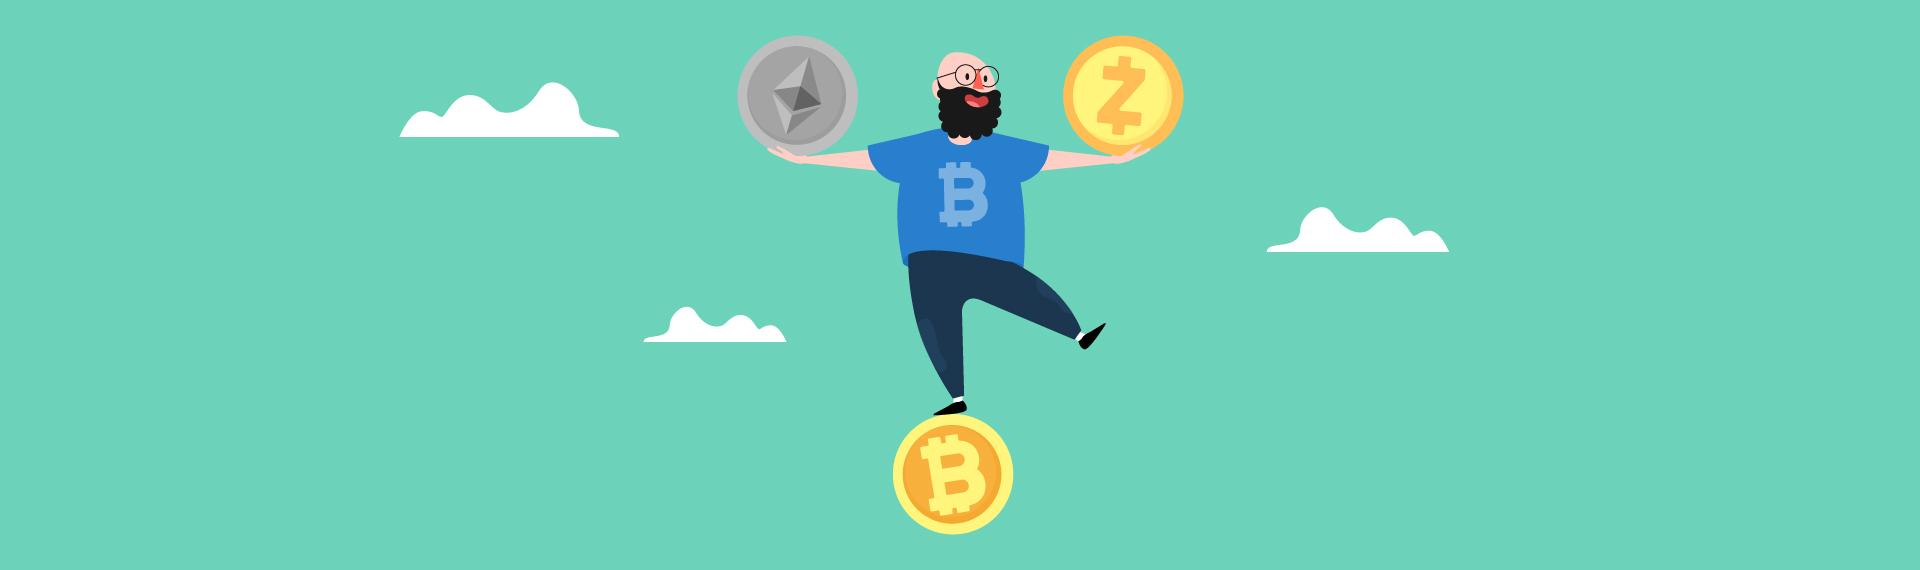 Blockchain technology affect on business.